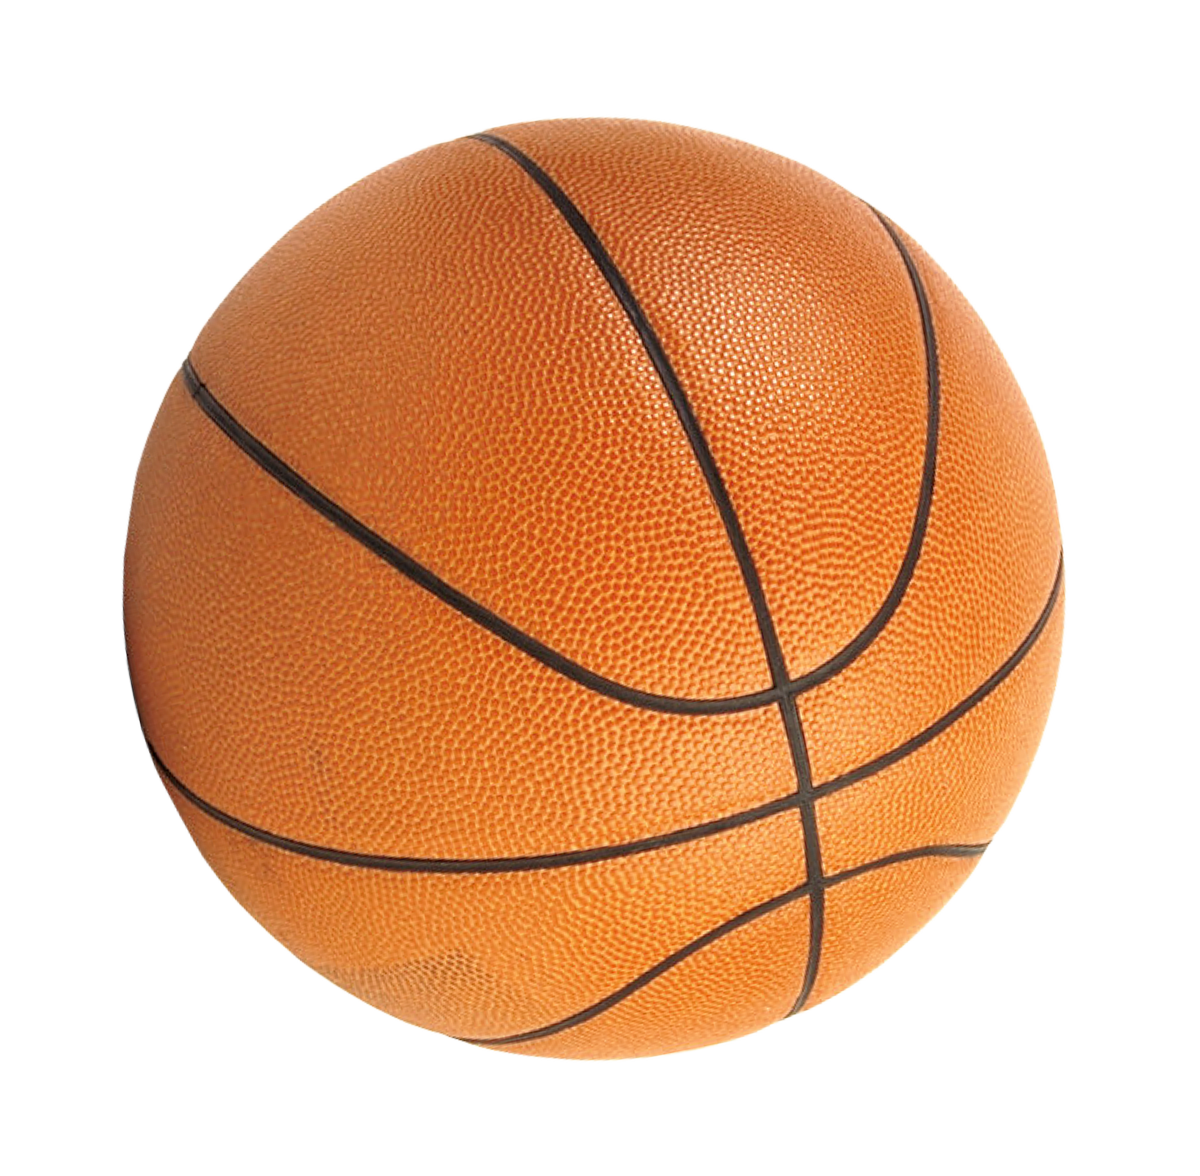 Basketball PNG Transparent Im